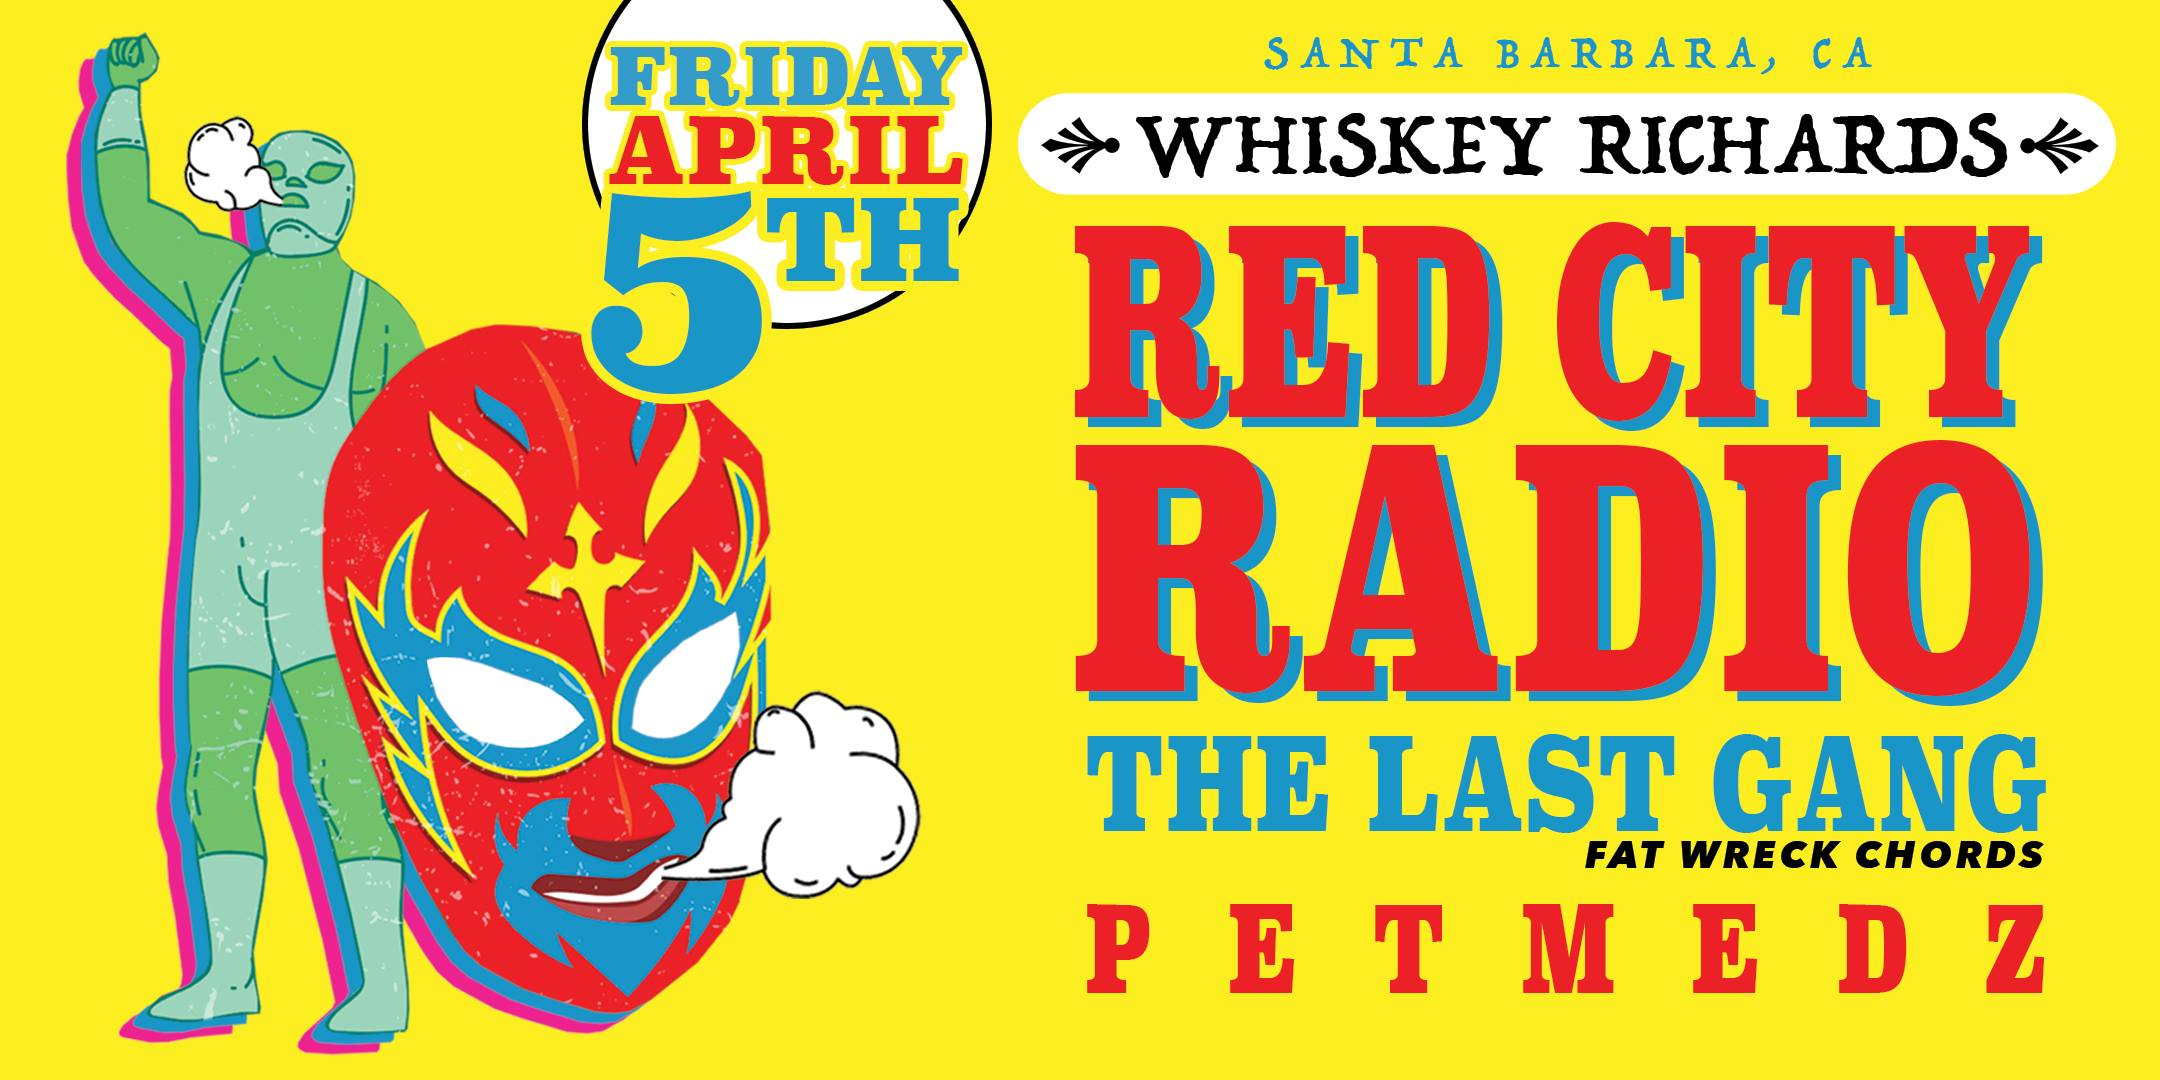 Red City Radio, The Last Gang, Petmedz - 9 PM - Close